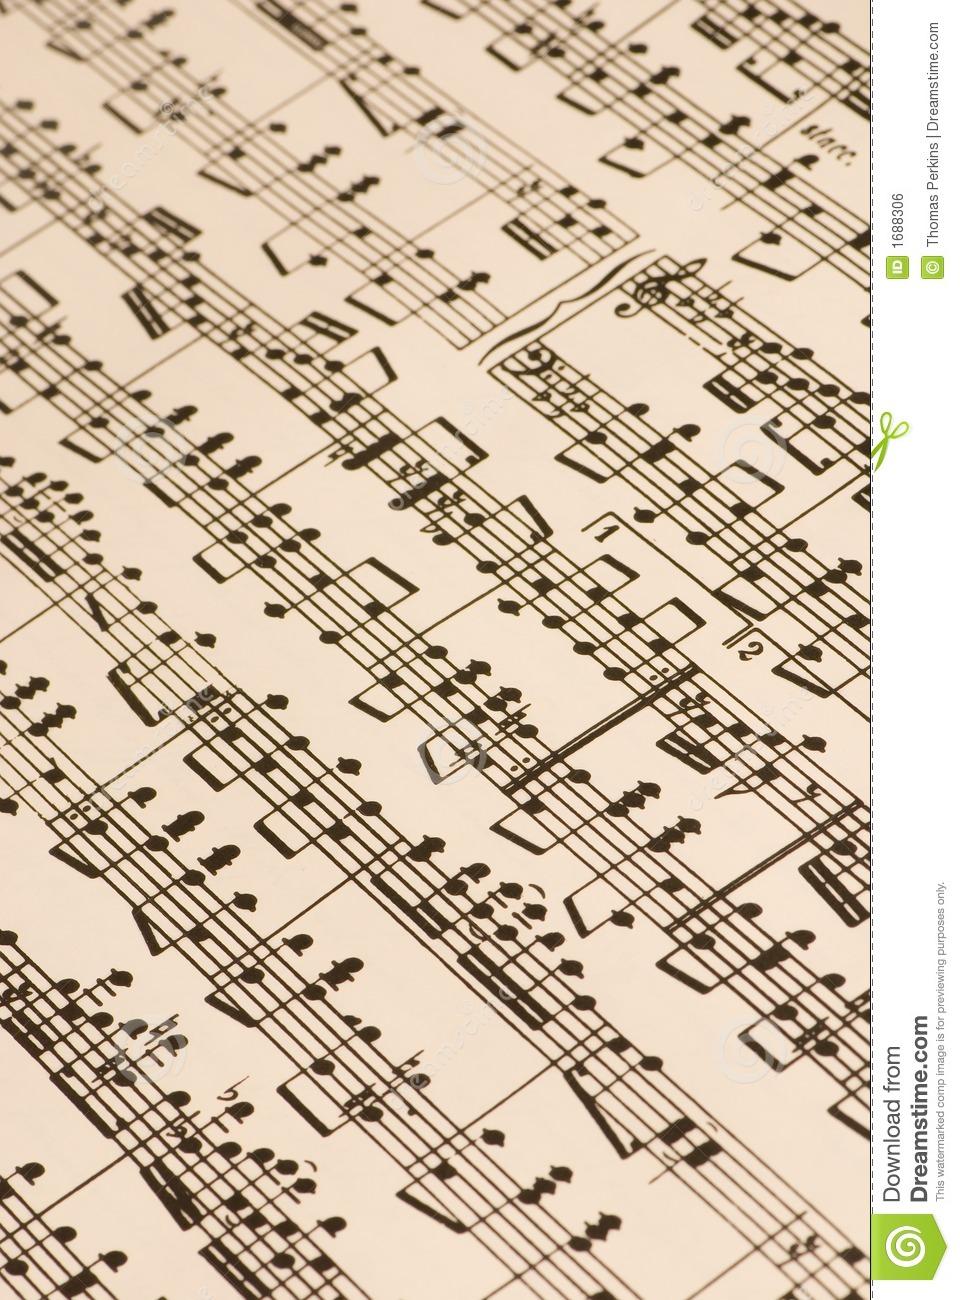 Music Score Clipart - Clipart Suggest